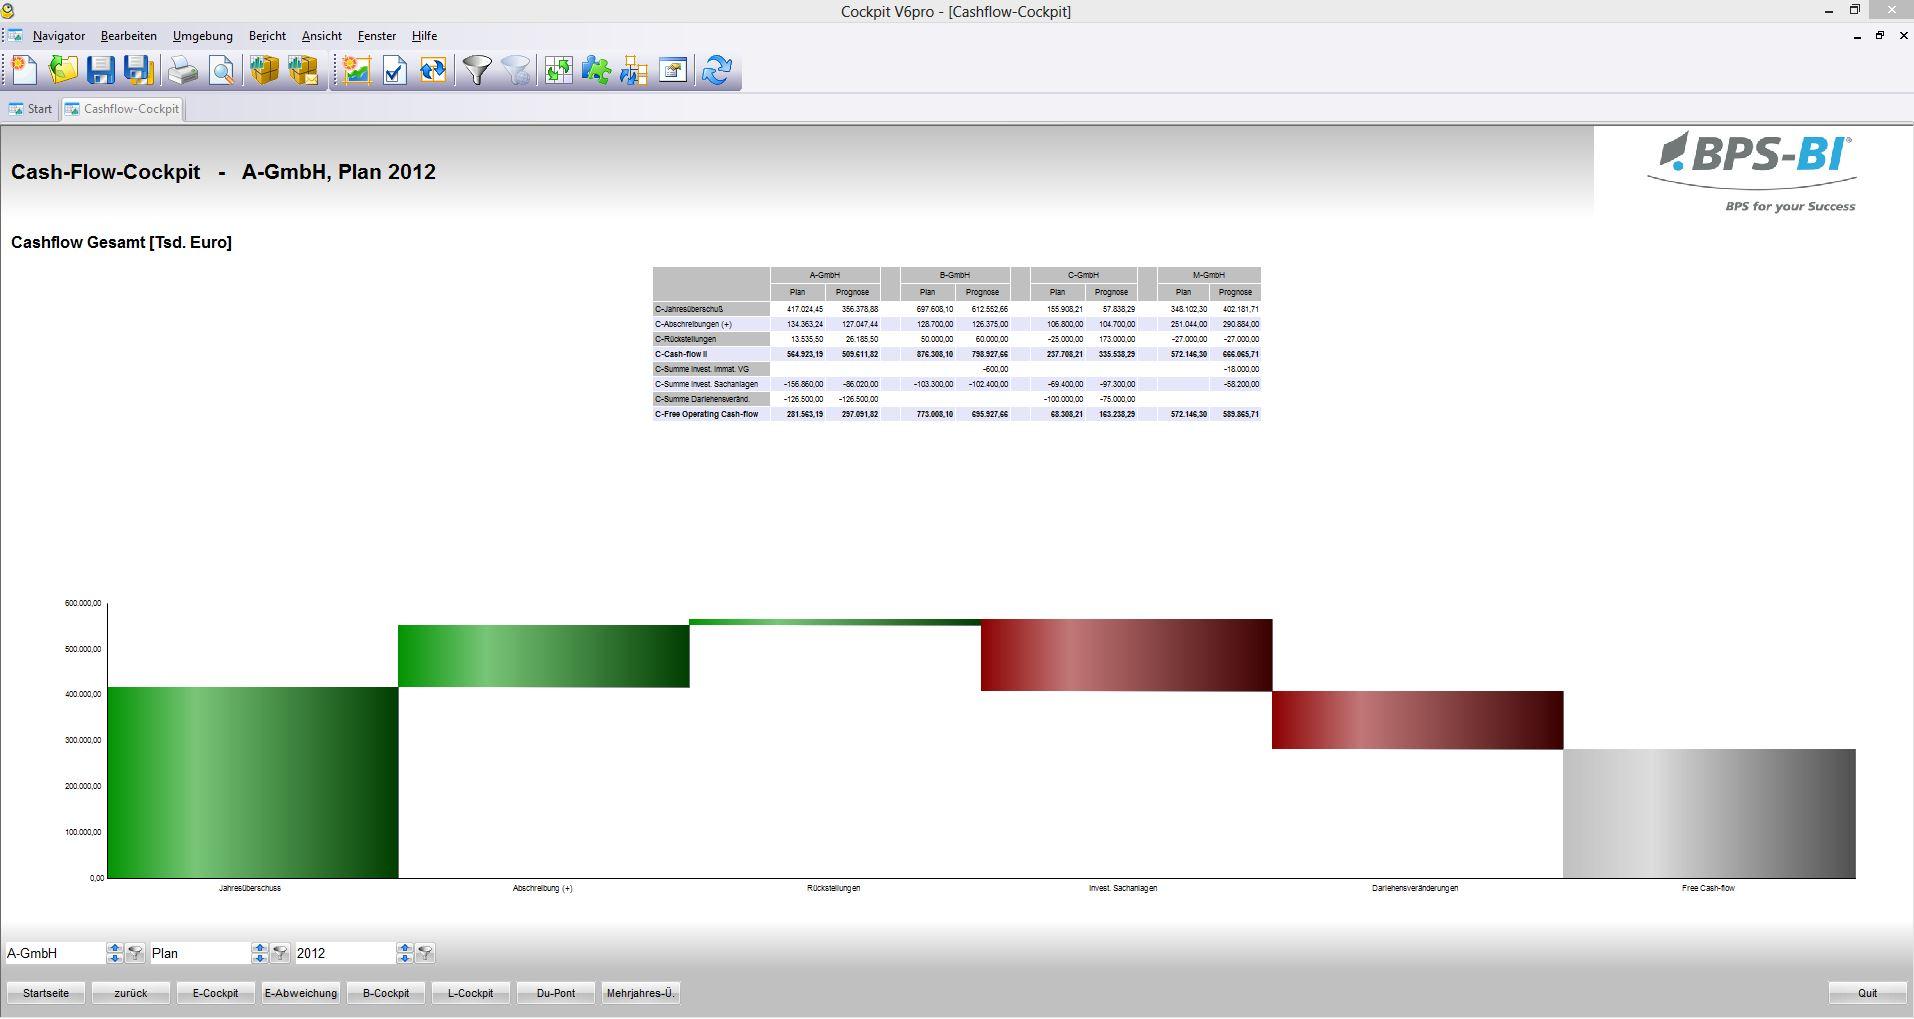 Screenshot: BPS-BI Cash-Flow-Cockput